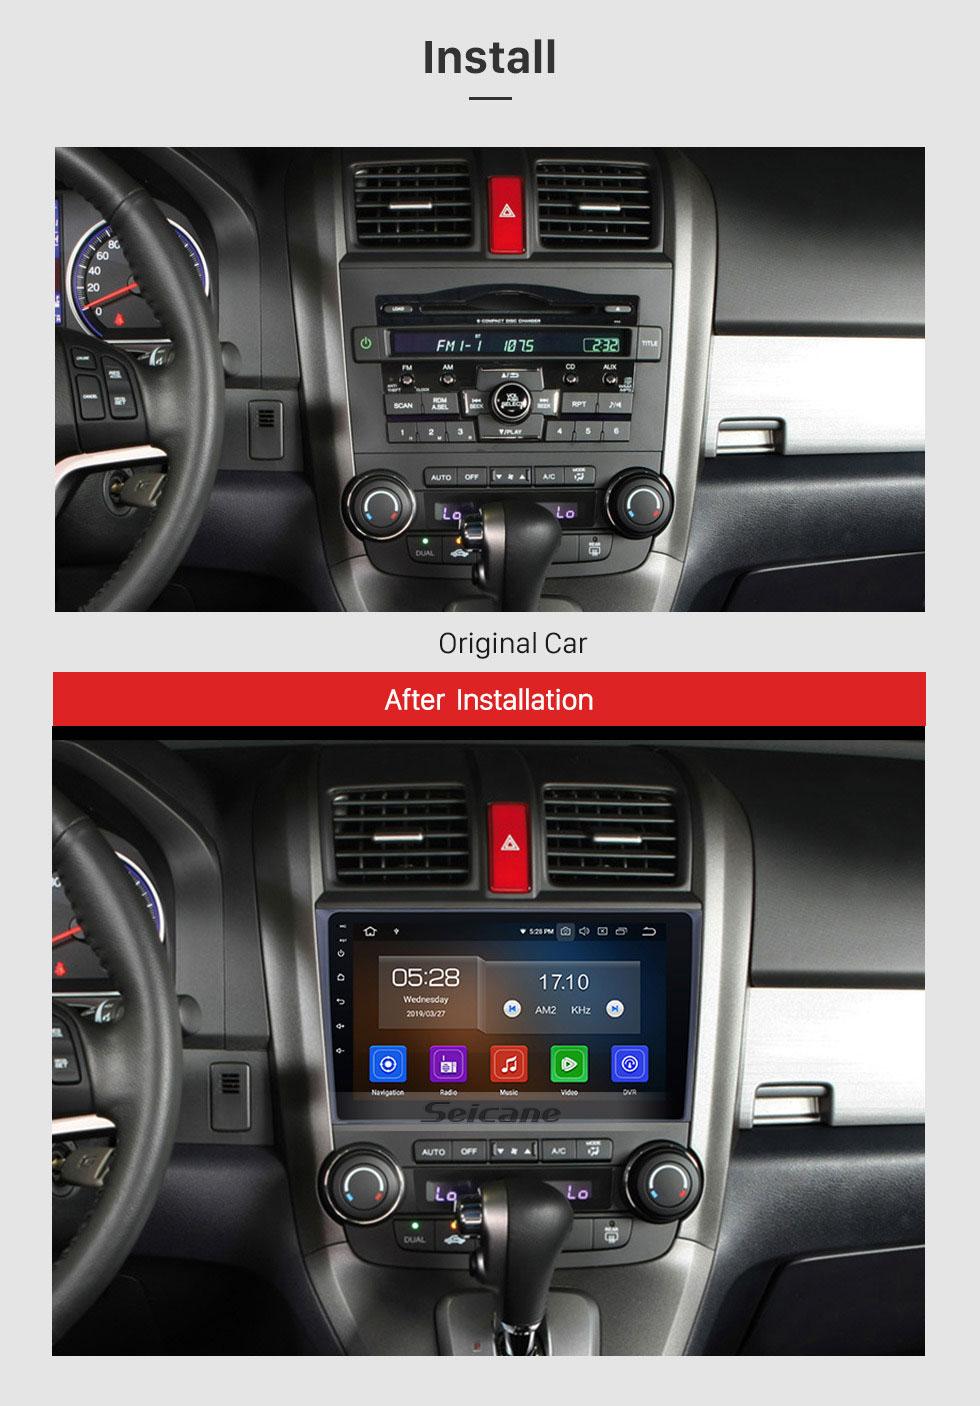 Seicane 2006-2011 HONDA CRV 9 inch Andriod 10.0 Radio GPS Navigatin System with bluetooth Digital TV Mirror Link OBD2 DVR Backup Camera TPMS RDS AUX Steering Wheel Control 4G Wifi